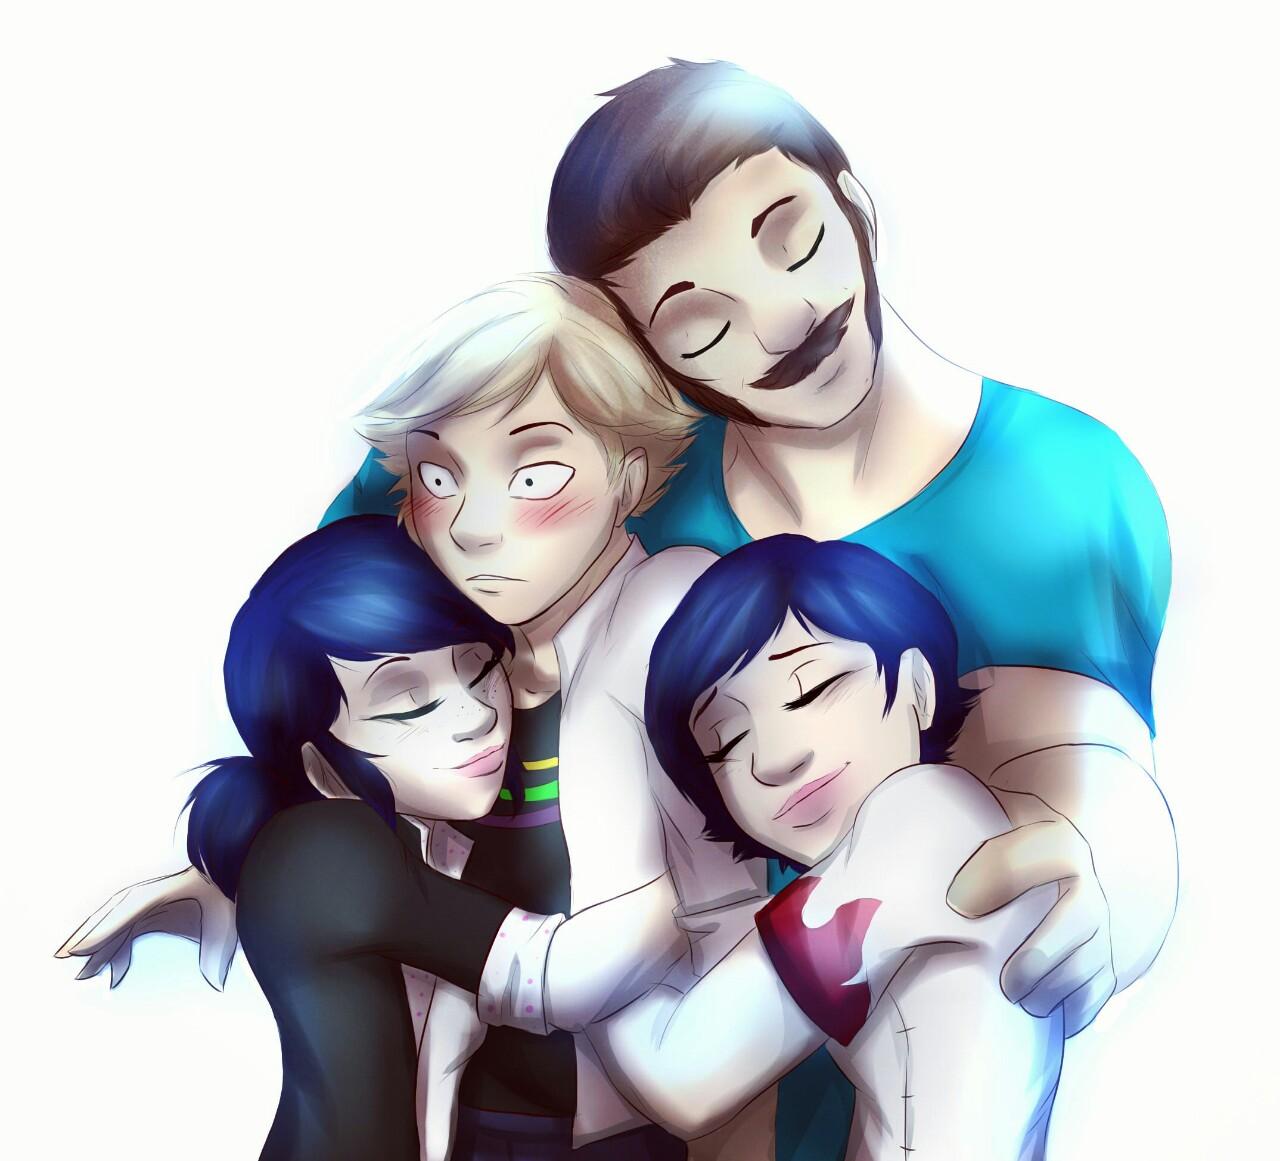 Adrien, Marinette, Tom and Sabine